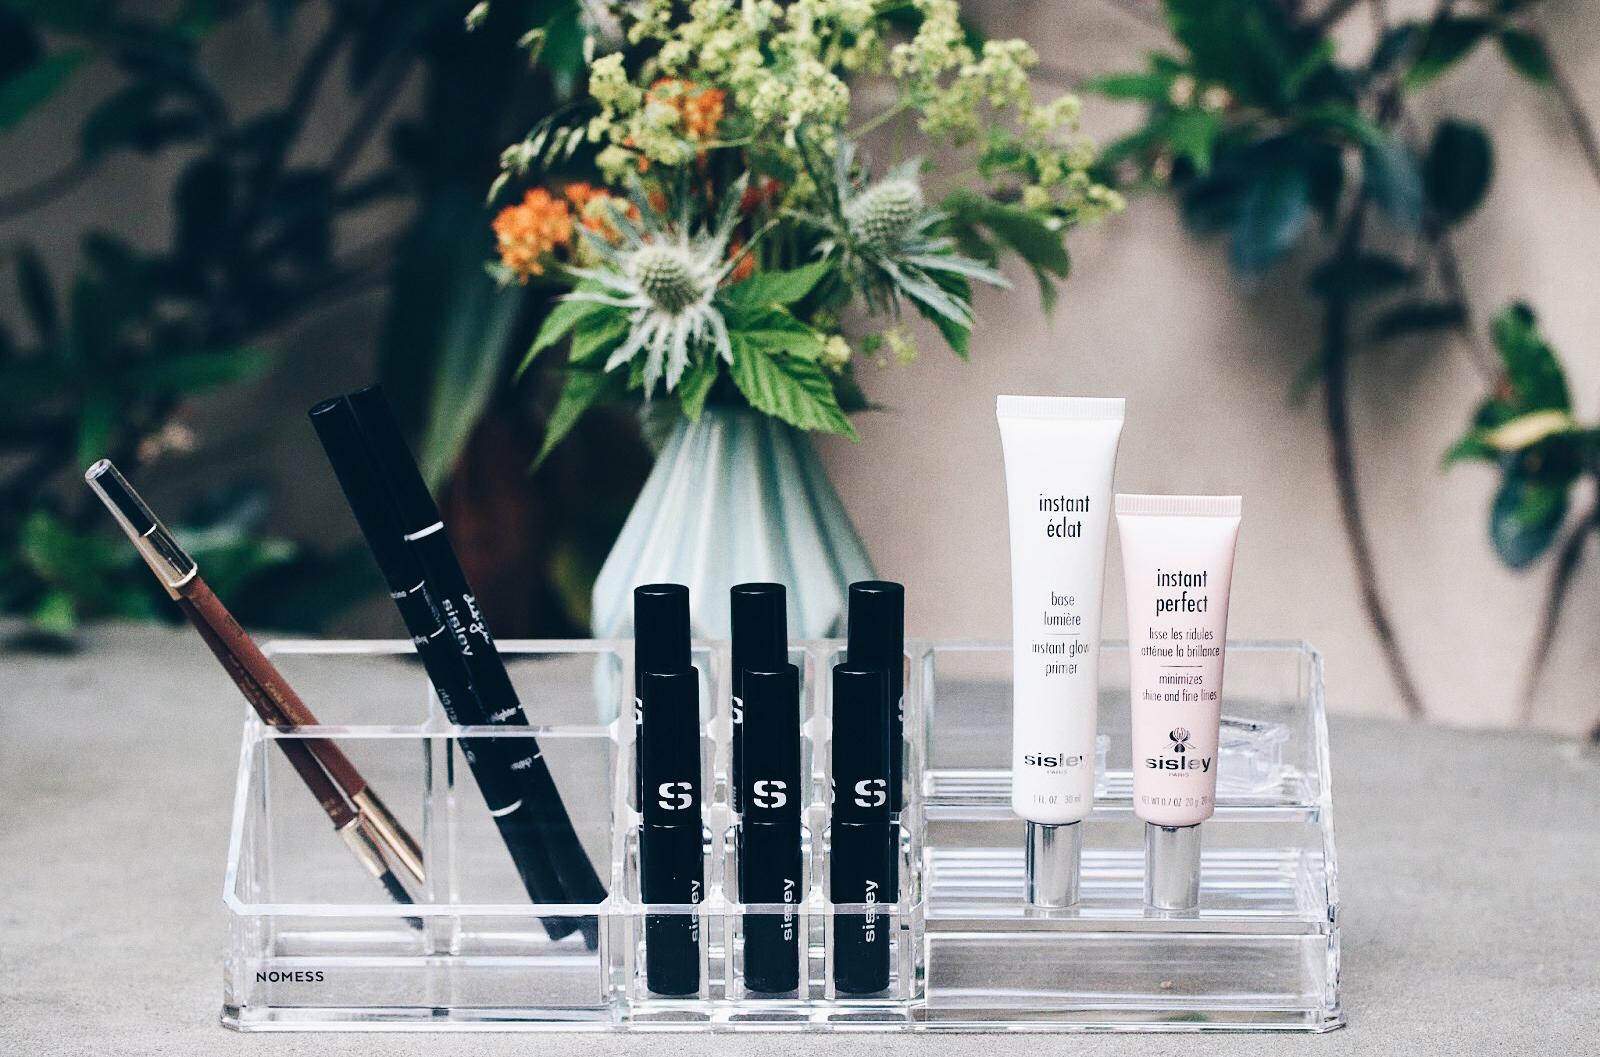 sisley nouveautés maquillage make up fall automne 2017